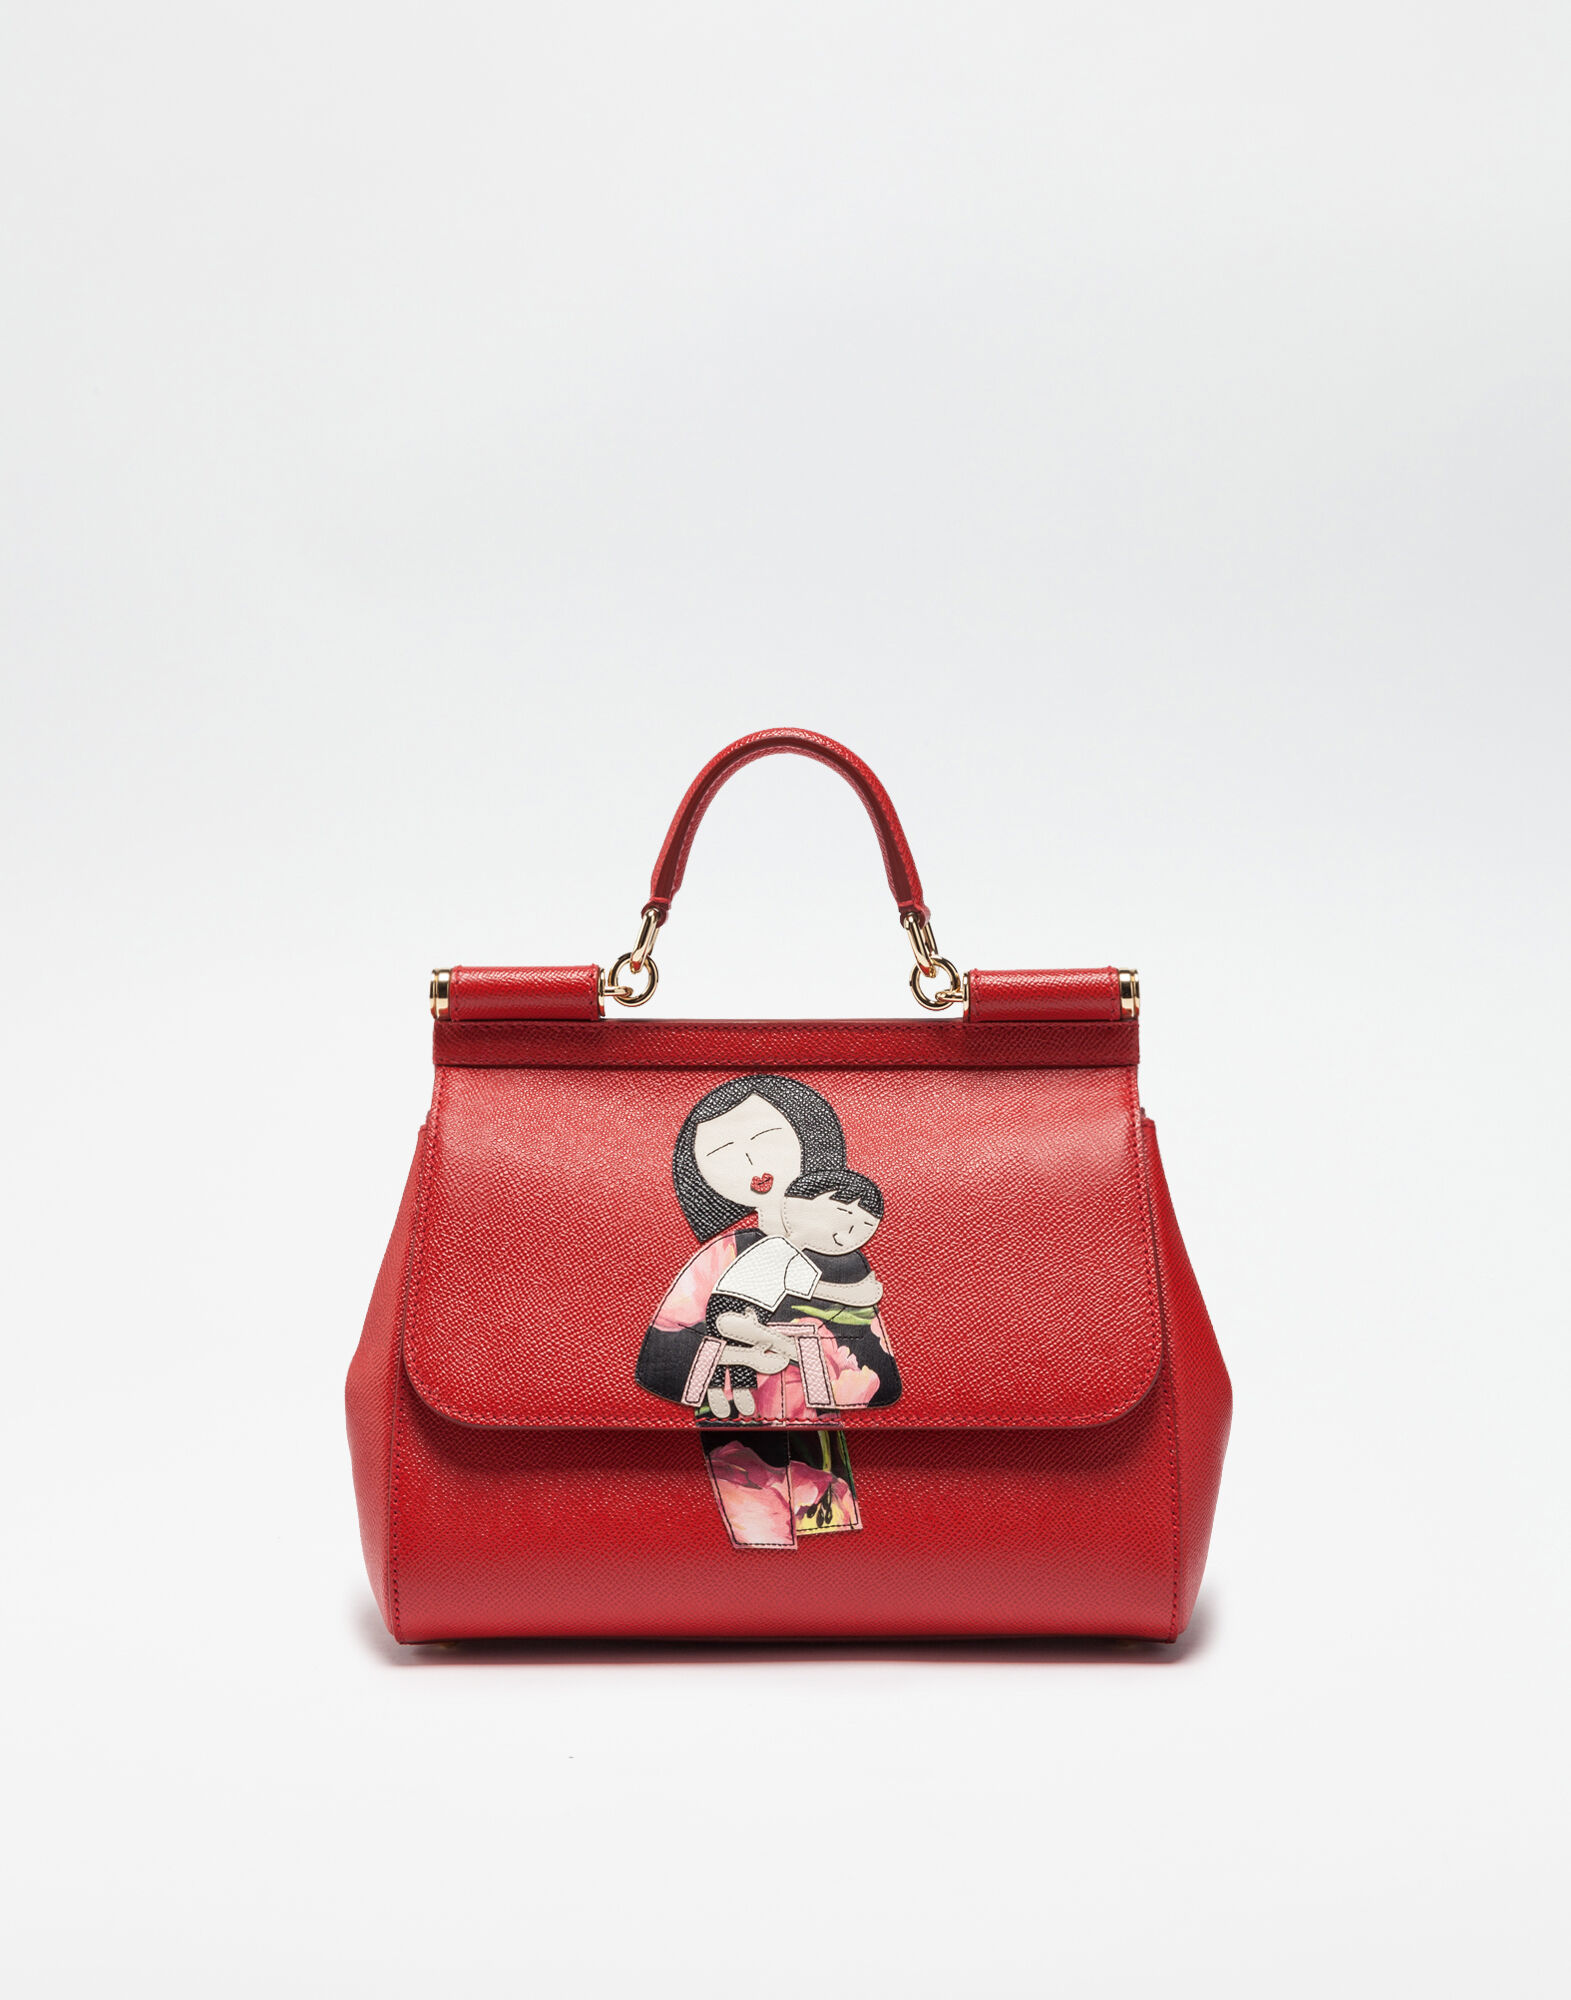 Footlocker Images En Ligne Pas Cher Dolce & Gabbana Embrayage Famille Dg - Rouge Eastbay Pas Cher Aii88udbb